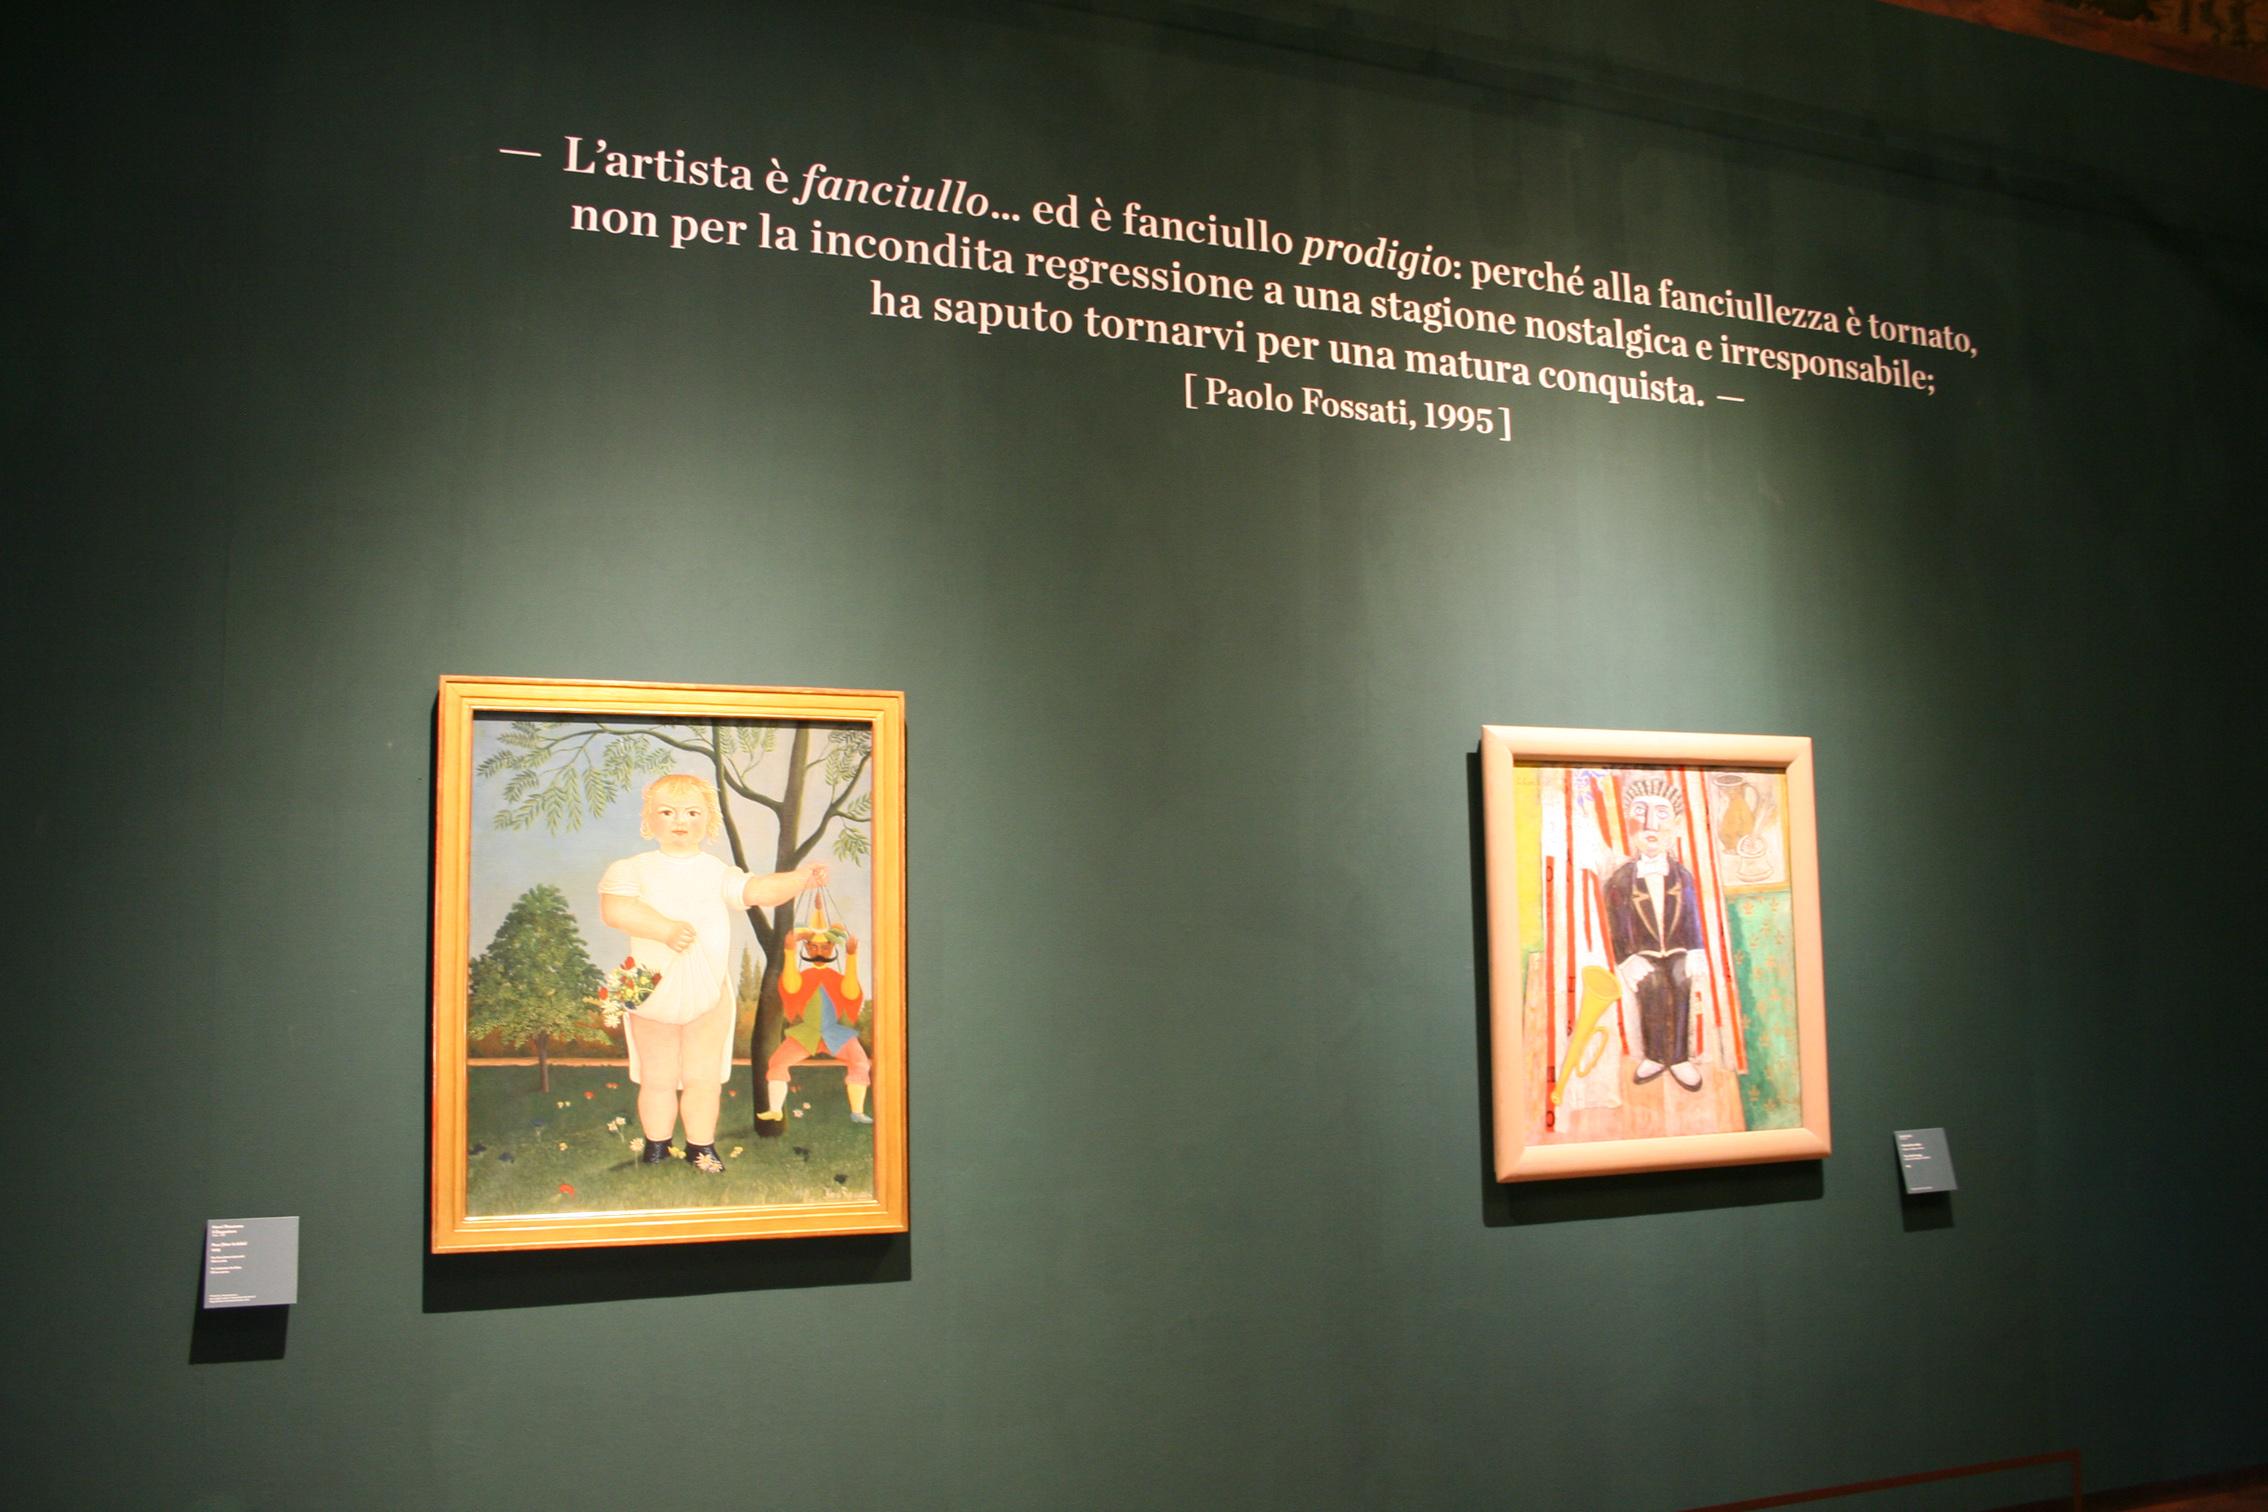 13. Henri Rousseau. Il candore arcaico Venezia Palazzo Ducale 4 marzo 2015